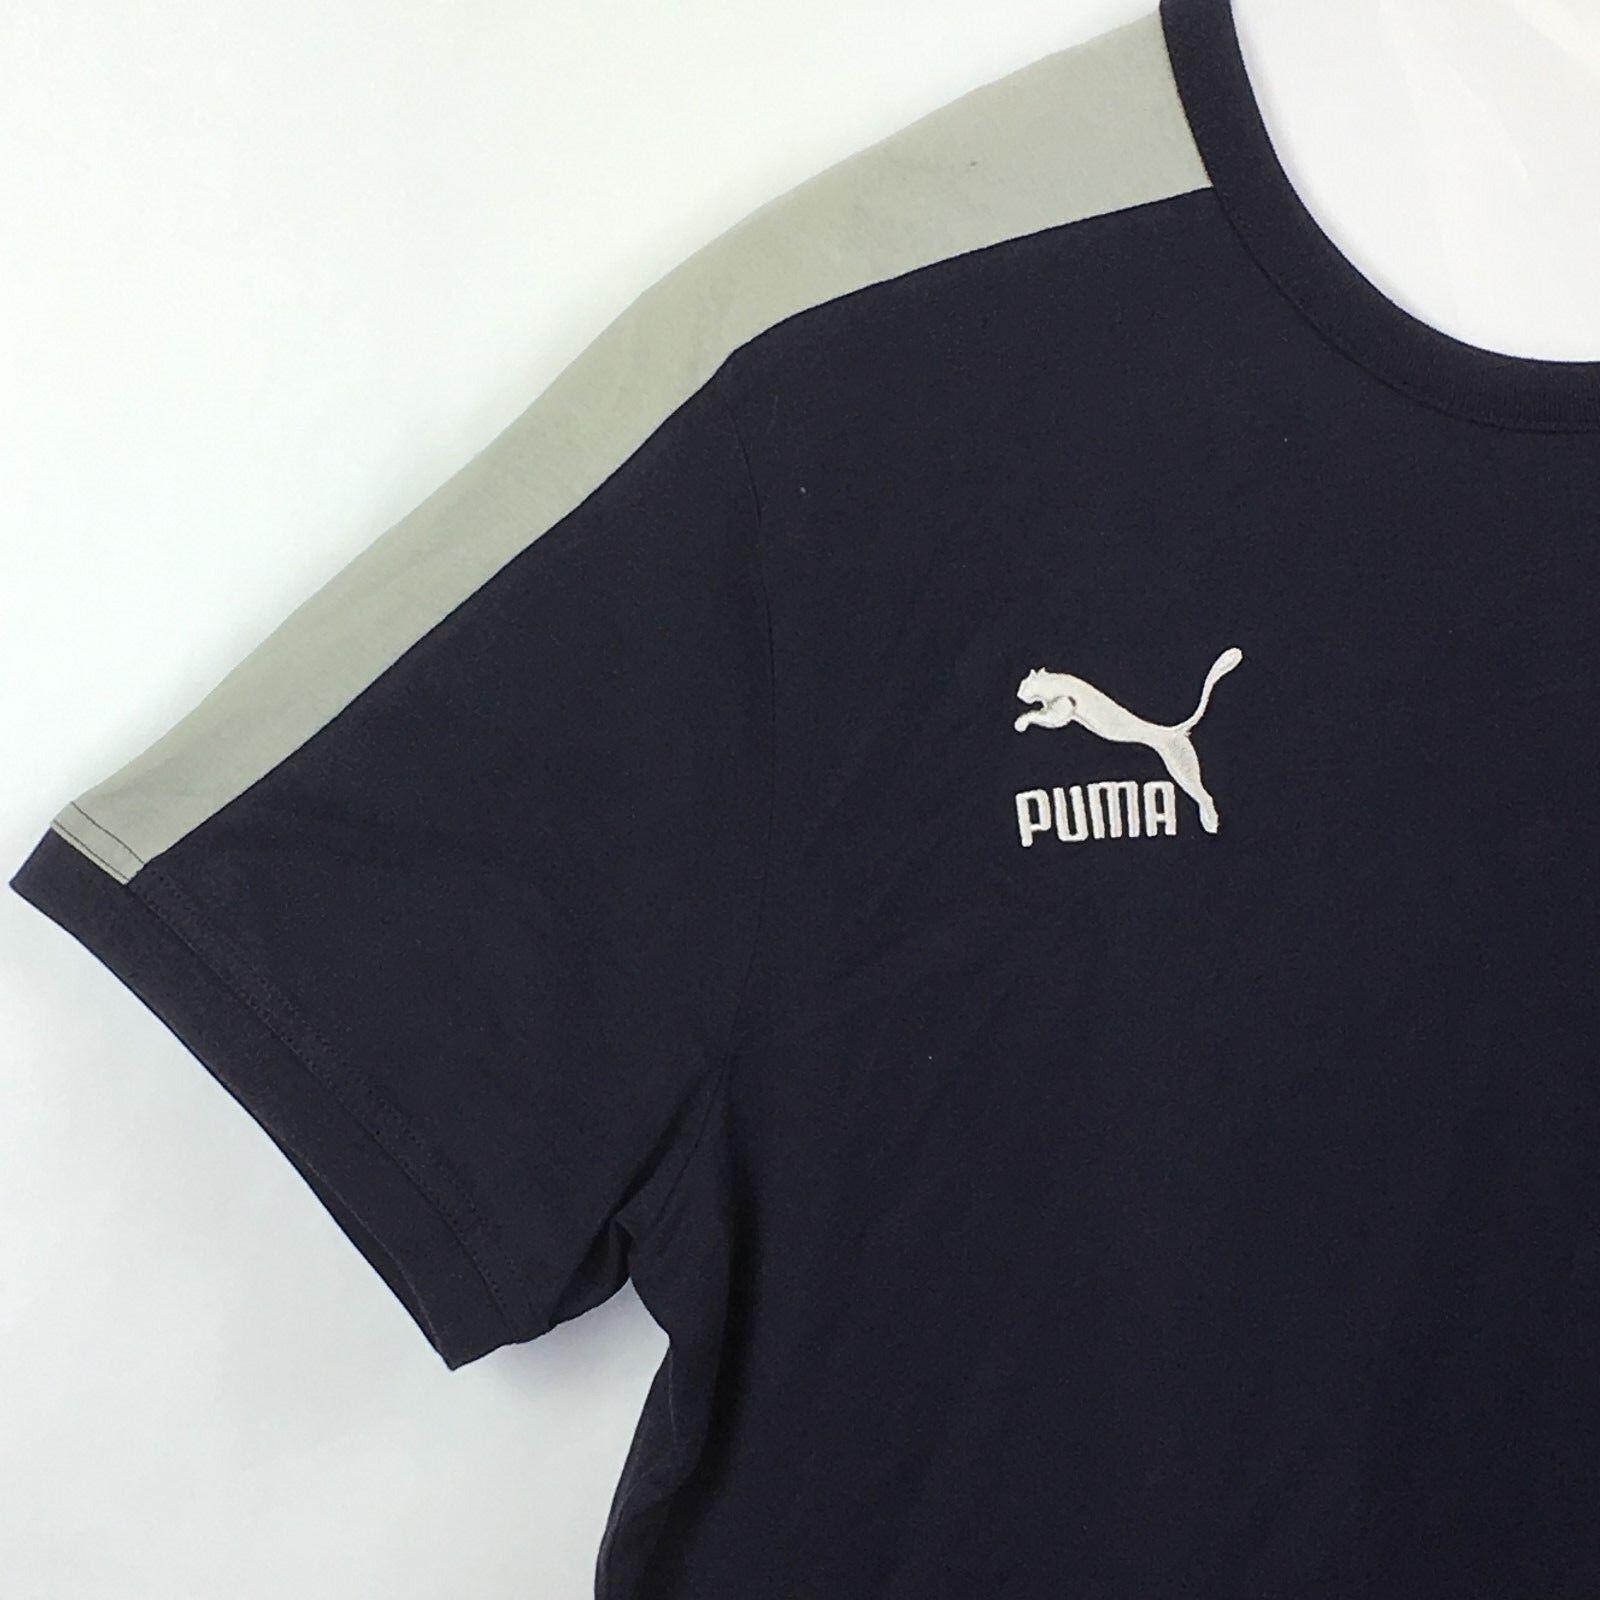 Details about Italia Soccer Puma Champion Del Mondo 1982 Embroidered Tee Men's Size XL